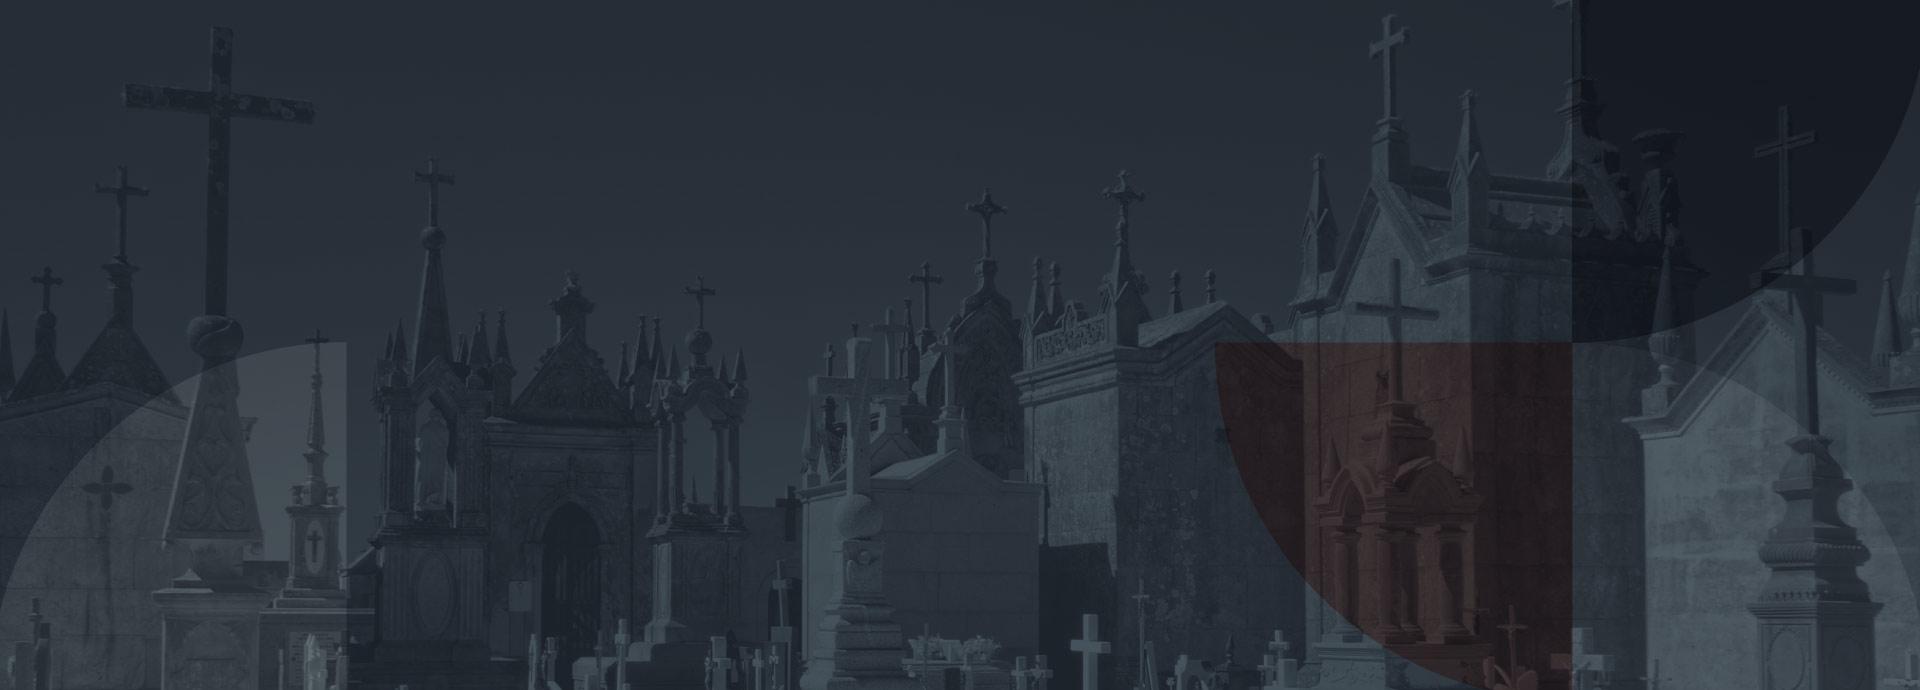 GREMIAL_FunerariasCrematoriosCementerios-